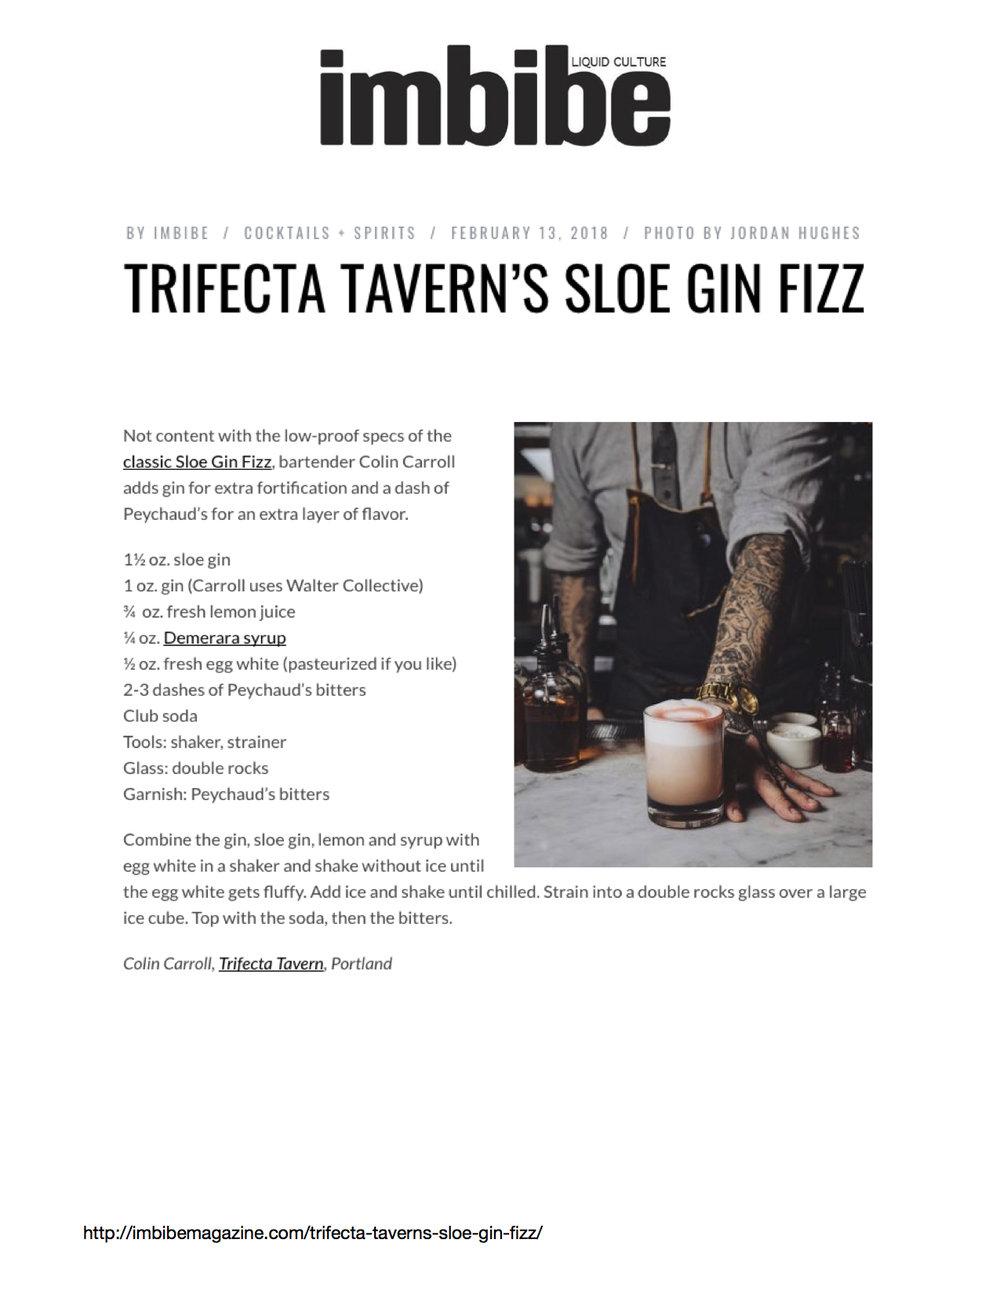 2.13.18Imbibe_Trifecta Tavern's Slow Gin Fizz.jpg